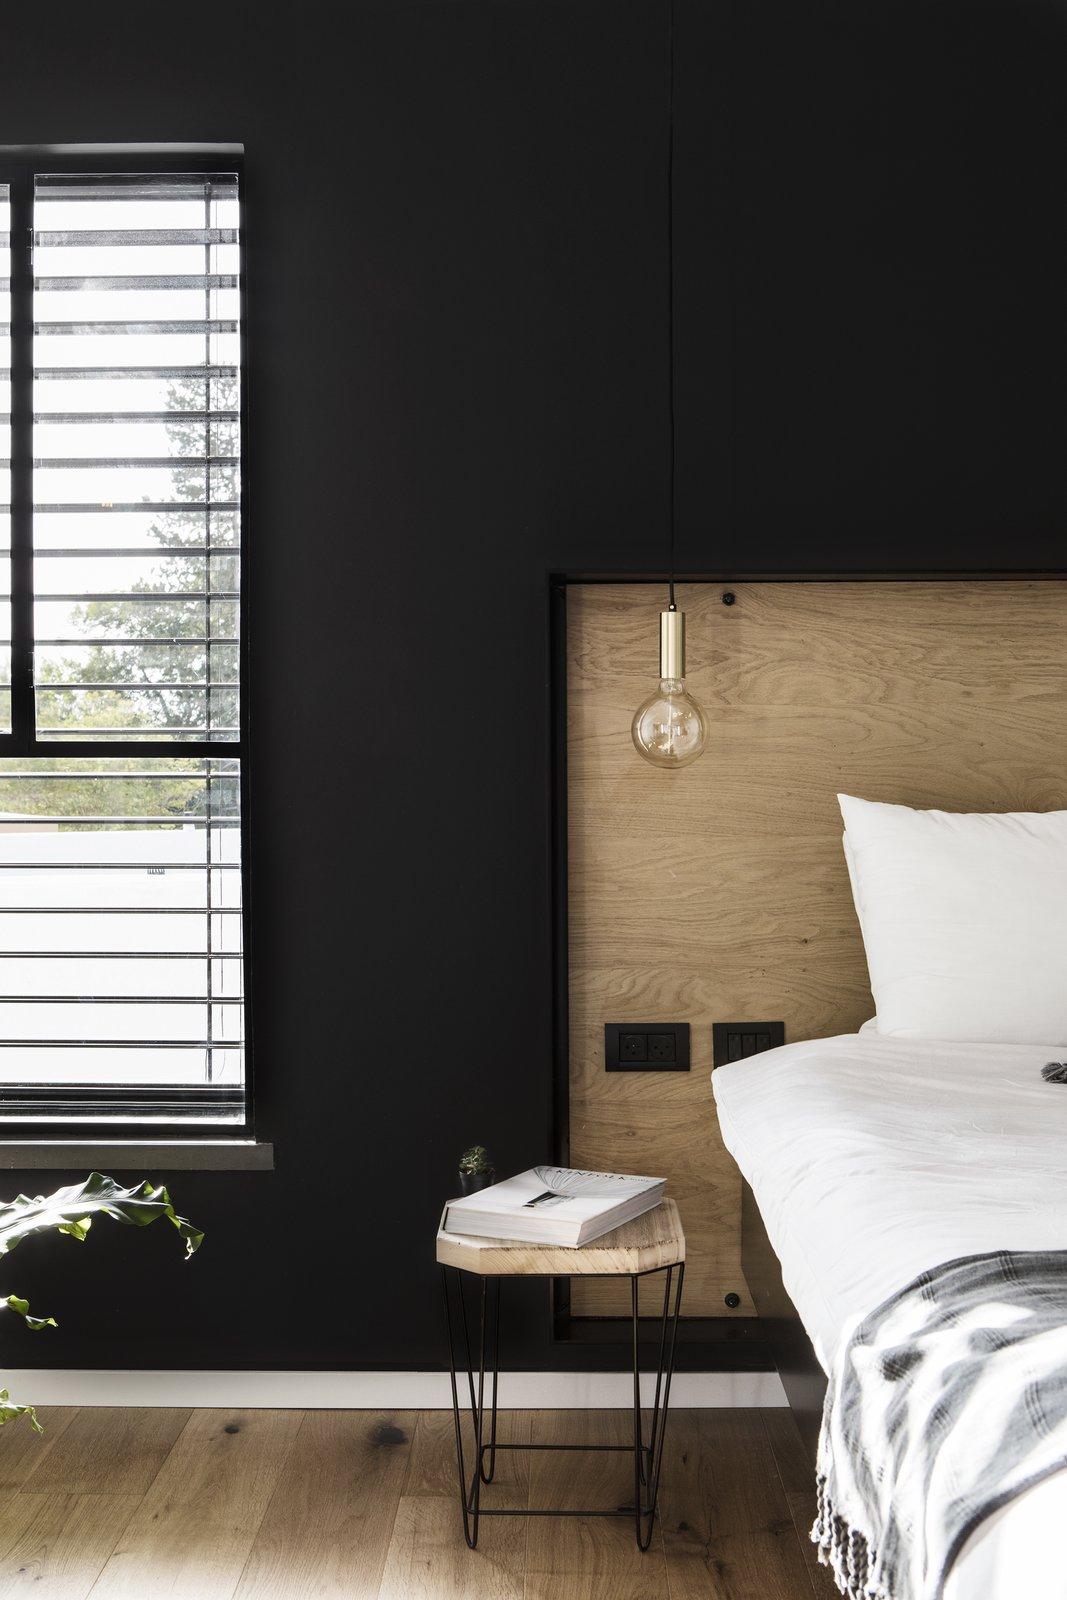 Bedroom  Nir Am House by Shir Shtaigman